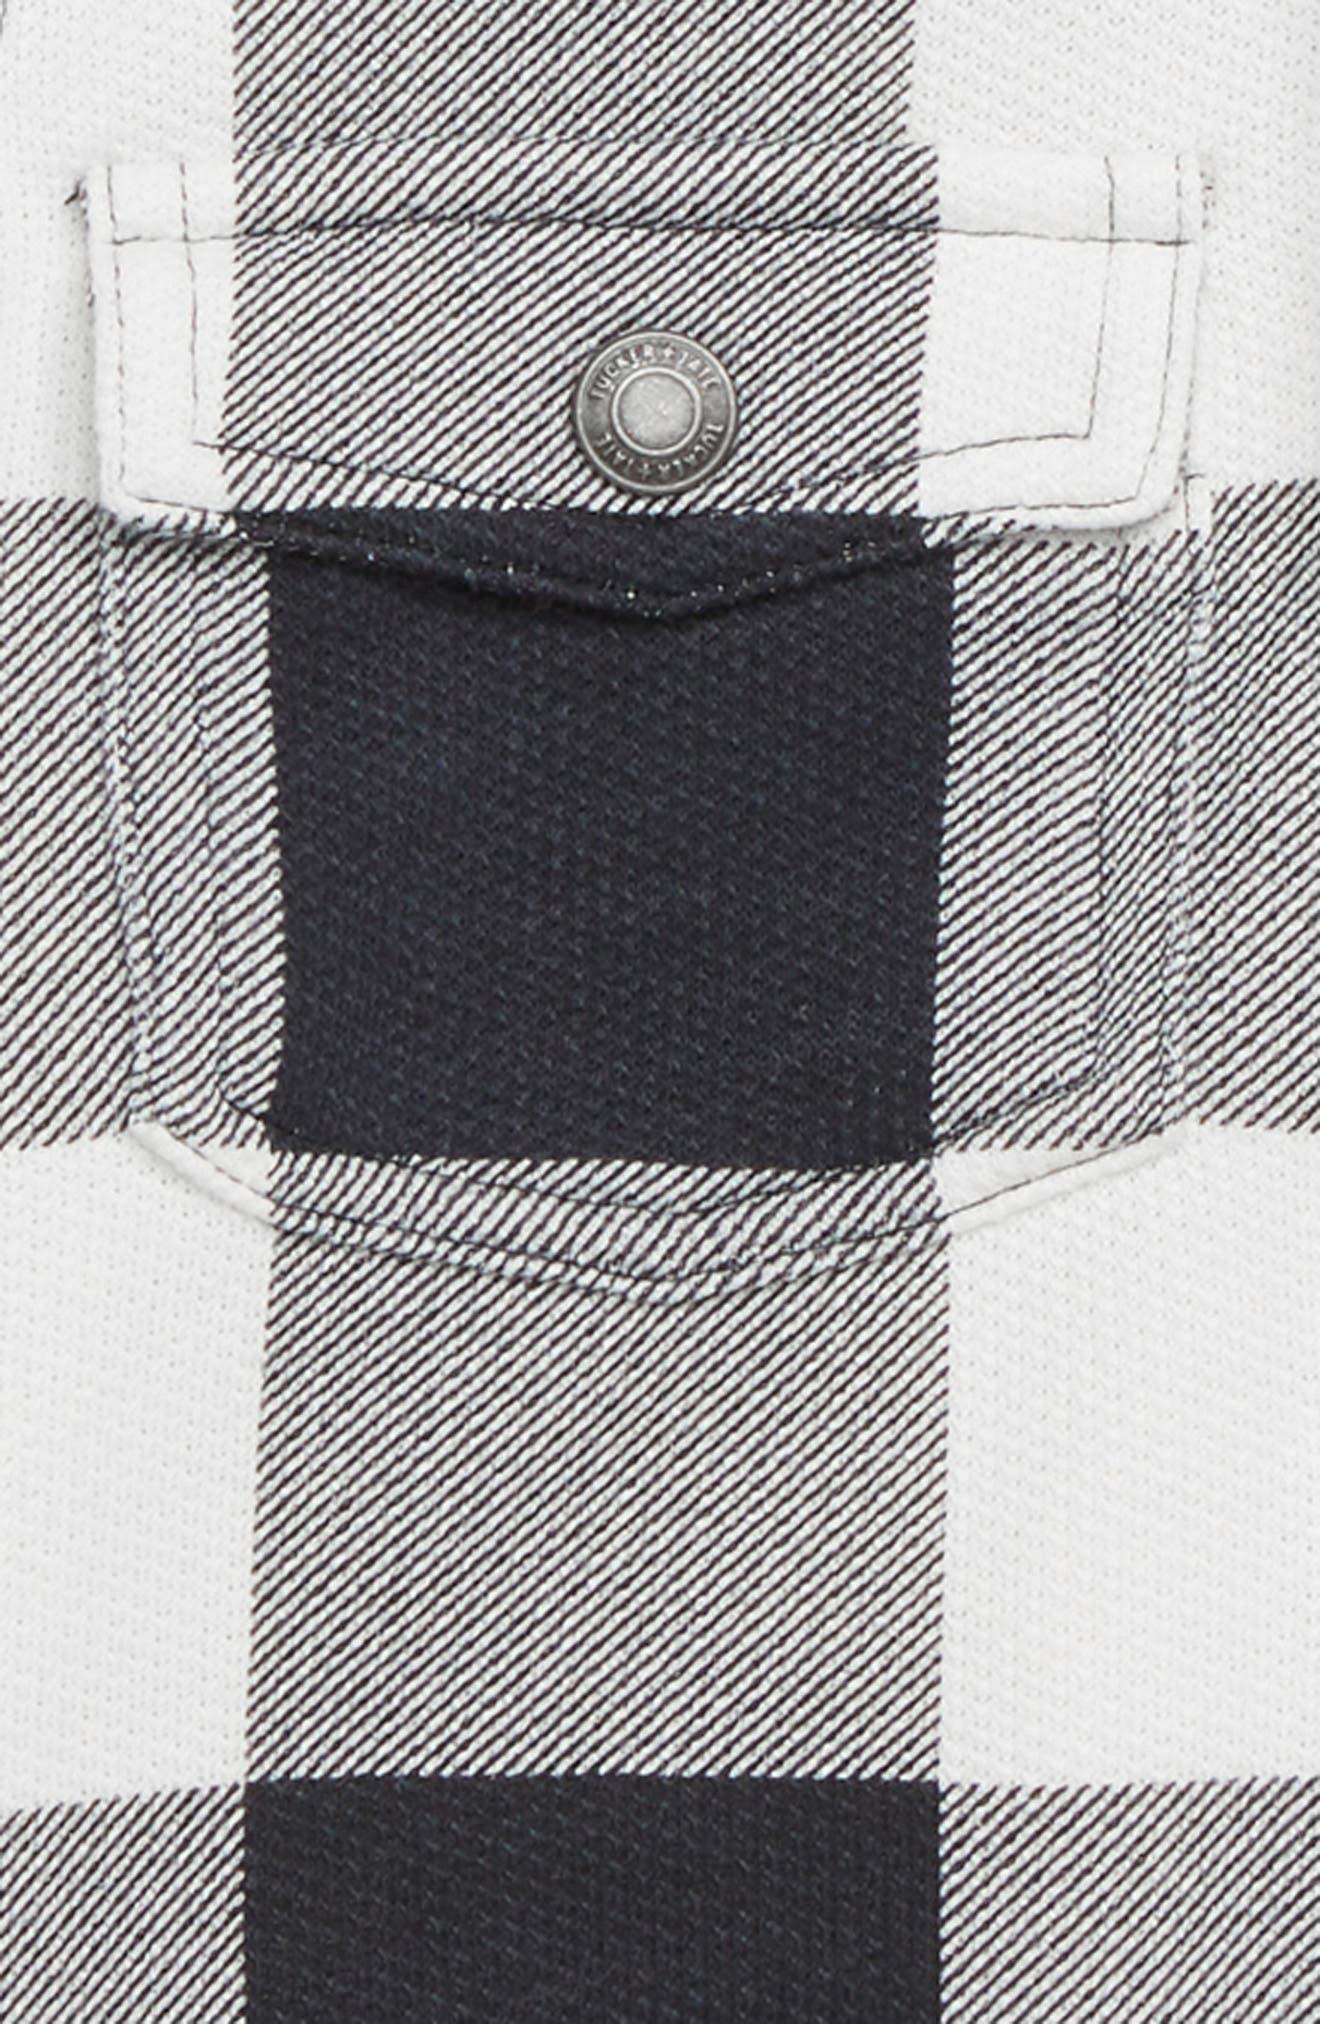 Buffalo Check Hooded Shirt,                             Alternate thumbnail 2, color,                             WHITE- BLACK GINGHAM